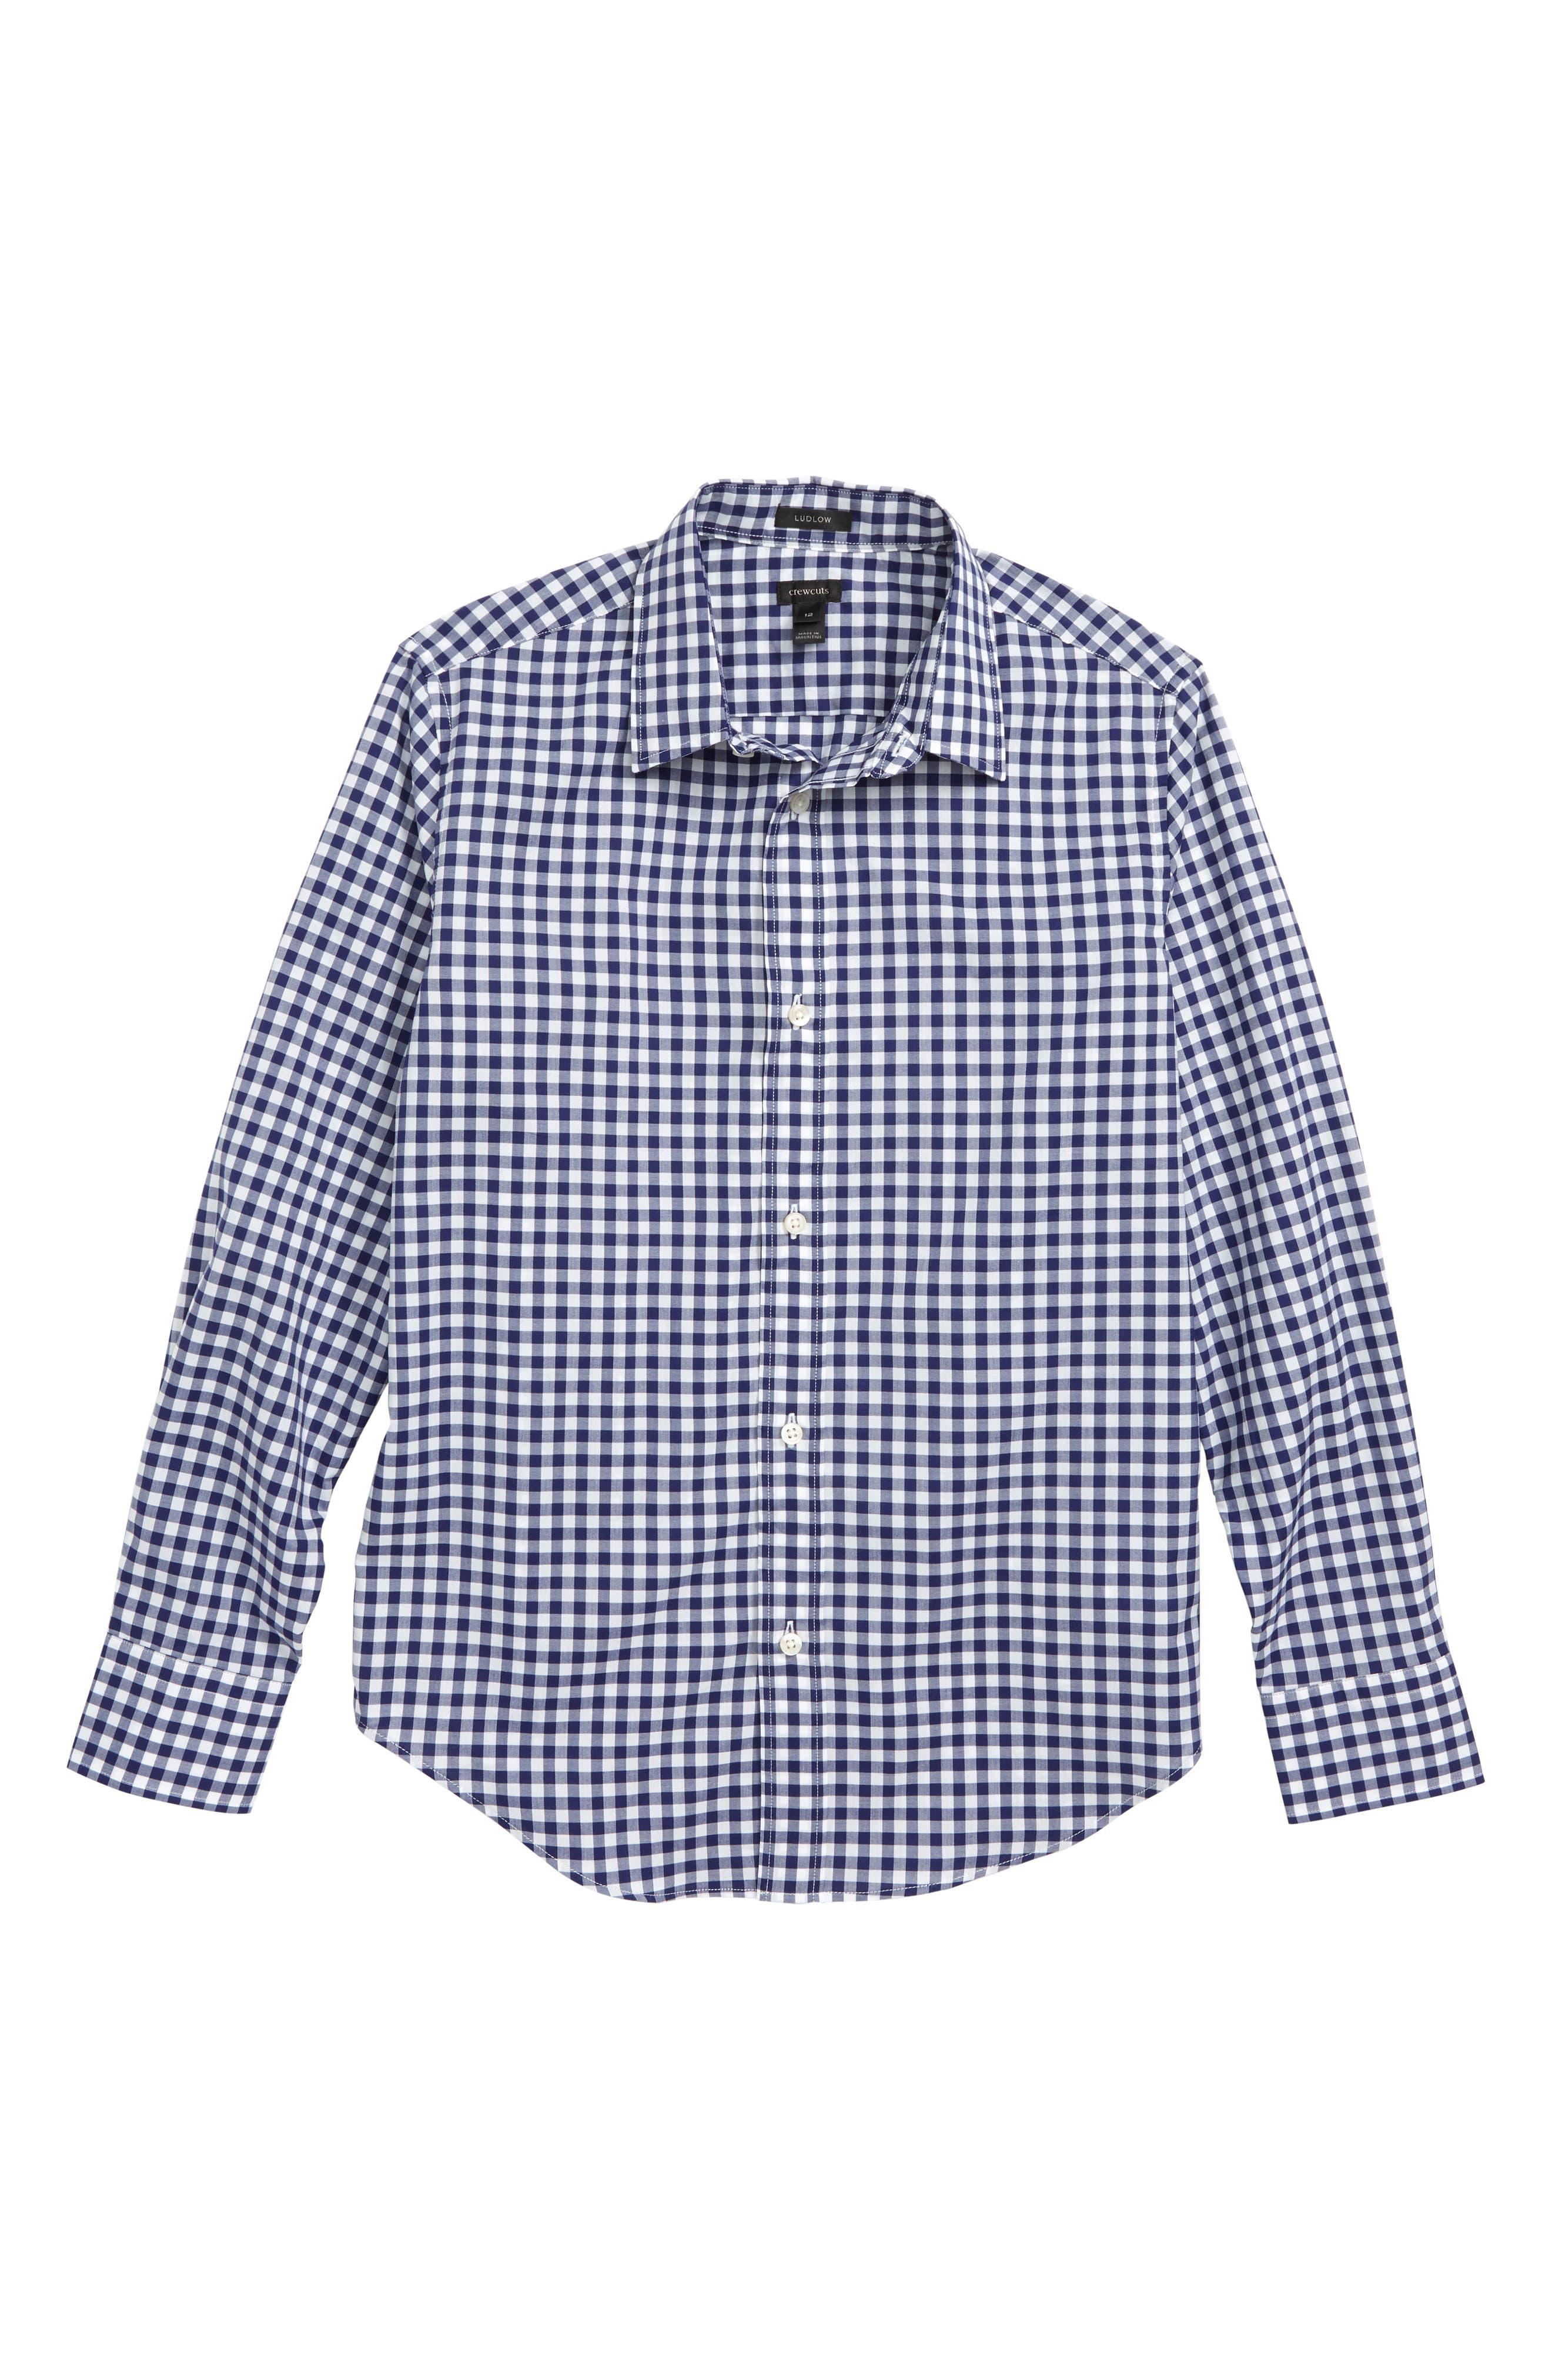 Ludlow Stripe Dress Shirt,                             Main thumbnail 1, color,                             400